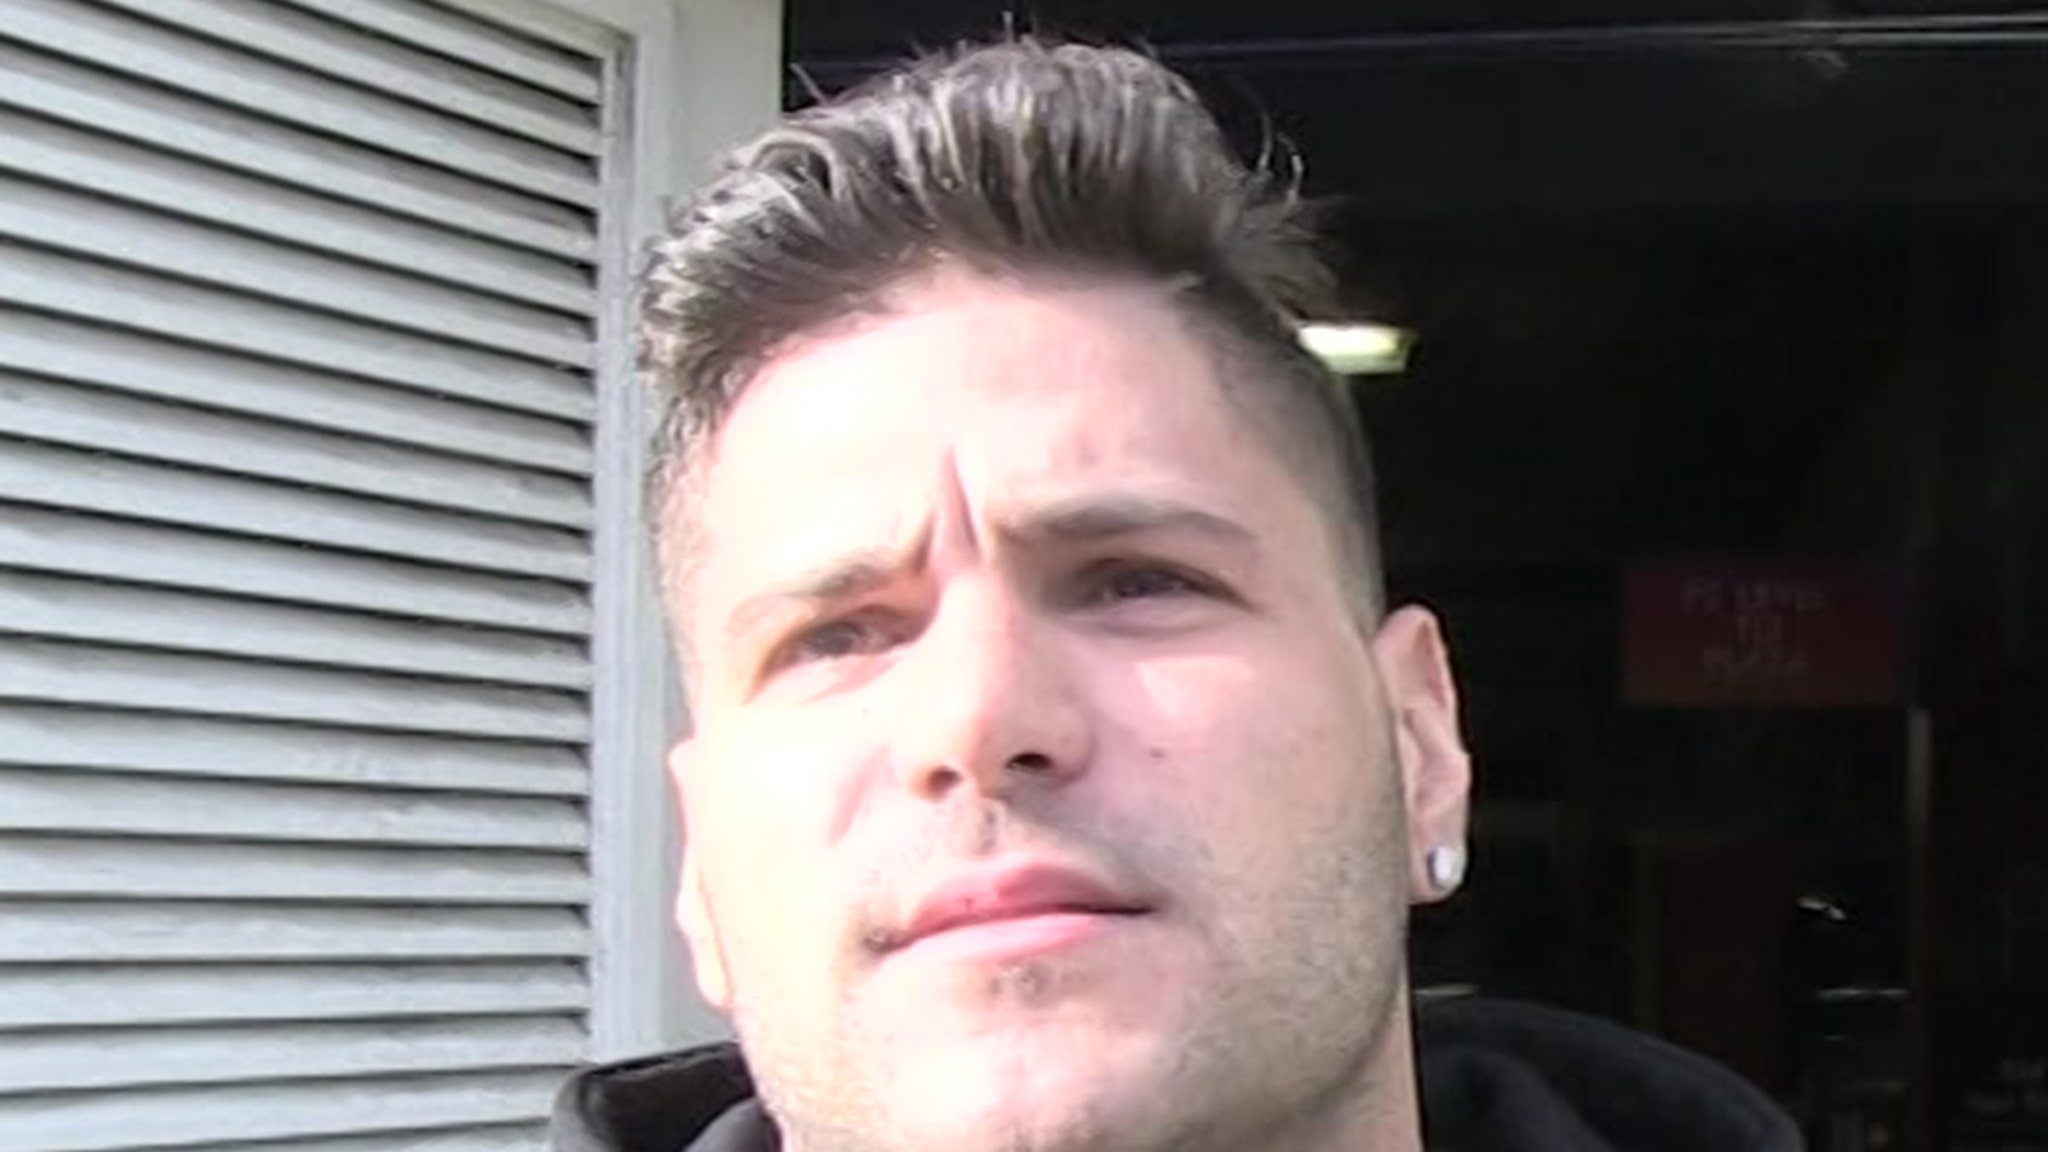 Ronnie Ortiz-Magro's GF Called Cops in DV Arrest, Had Visible Marks - TMZ